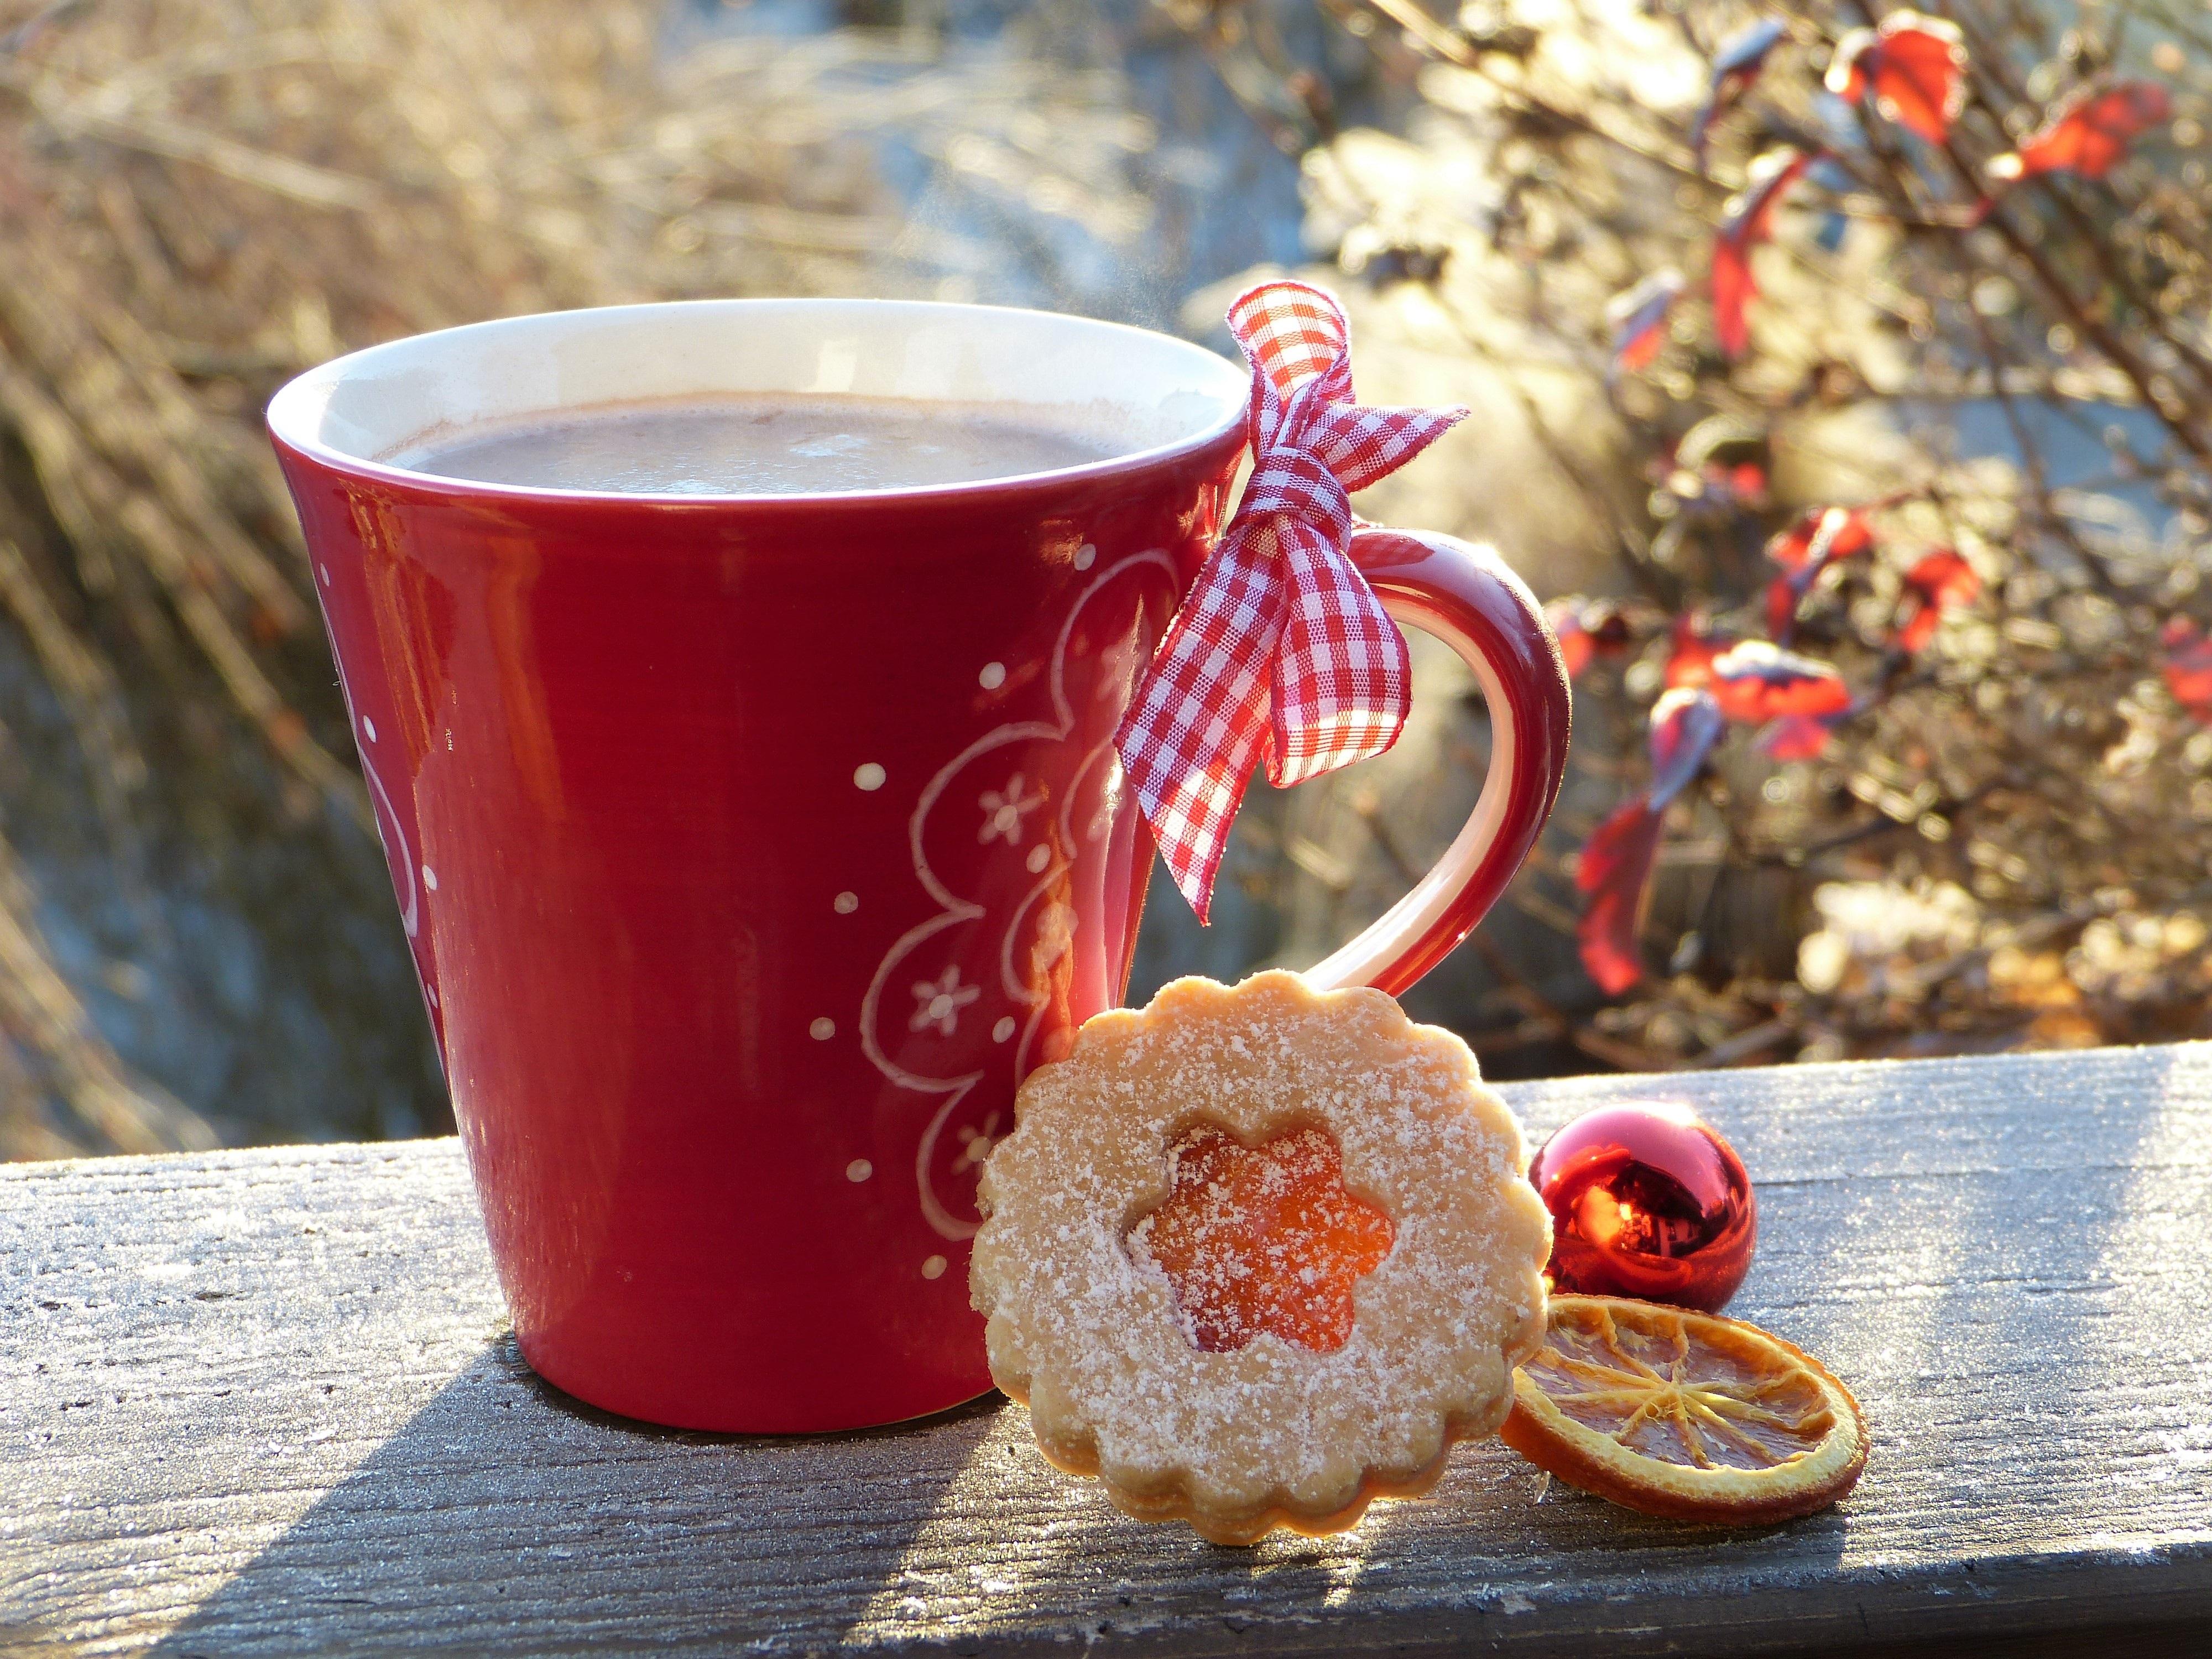 картинки доброе утро позитивные красочные природа зима огромном